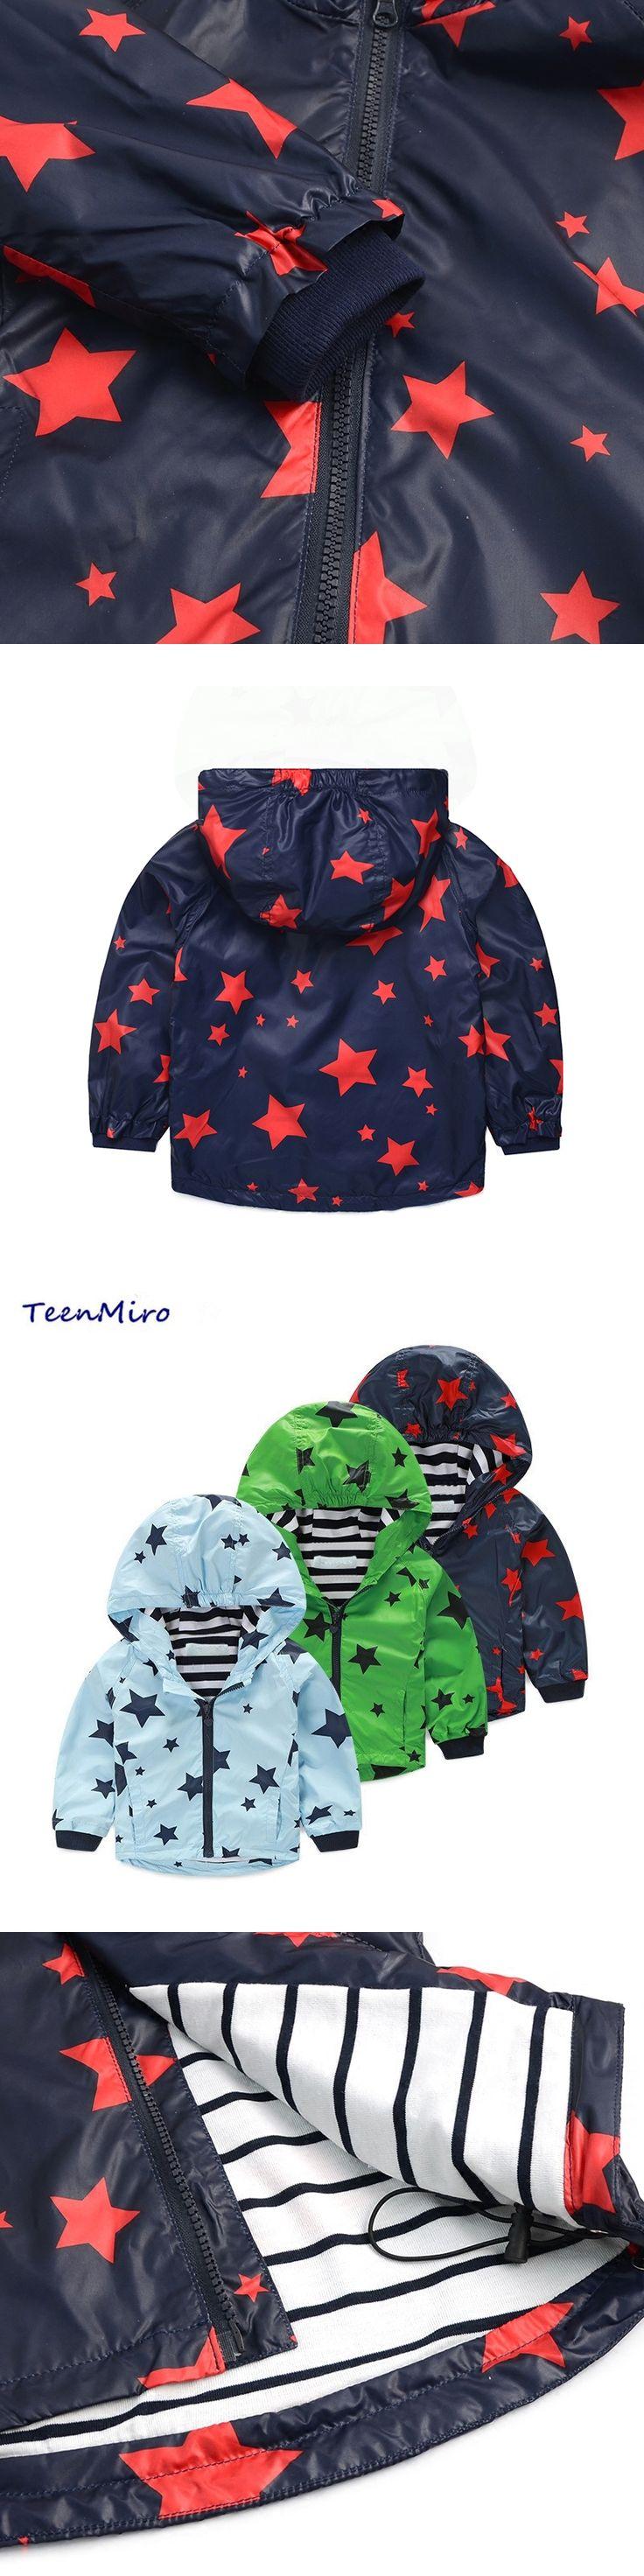 Hooded Boys clothes Spring Jacket Windbreaker Stars Children outerwear Waterproof Kids Coats toddler boy clothing baby outwear